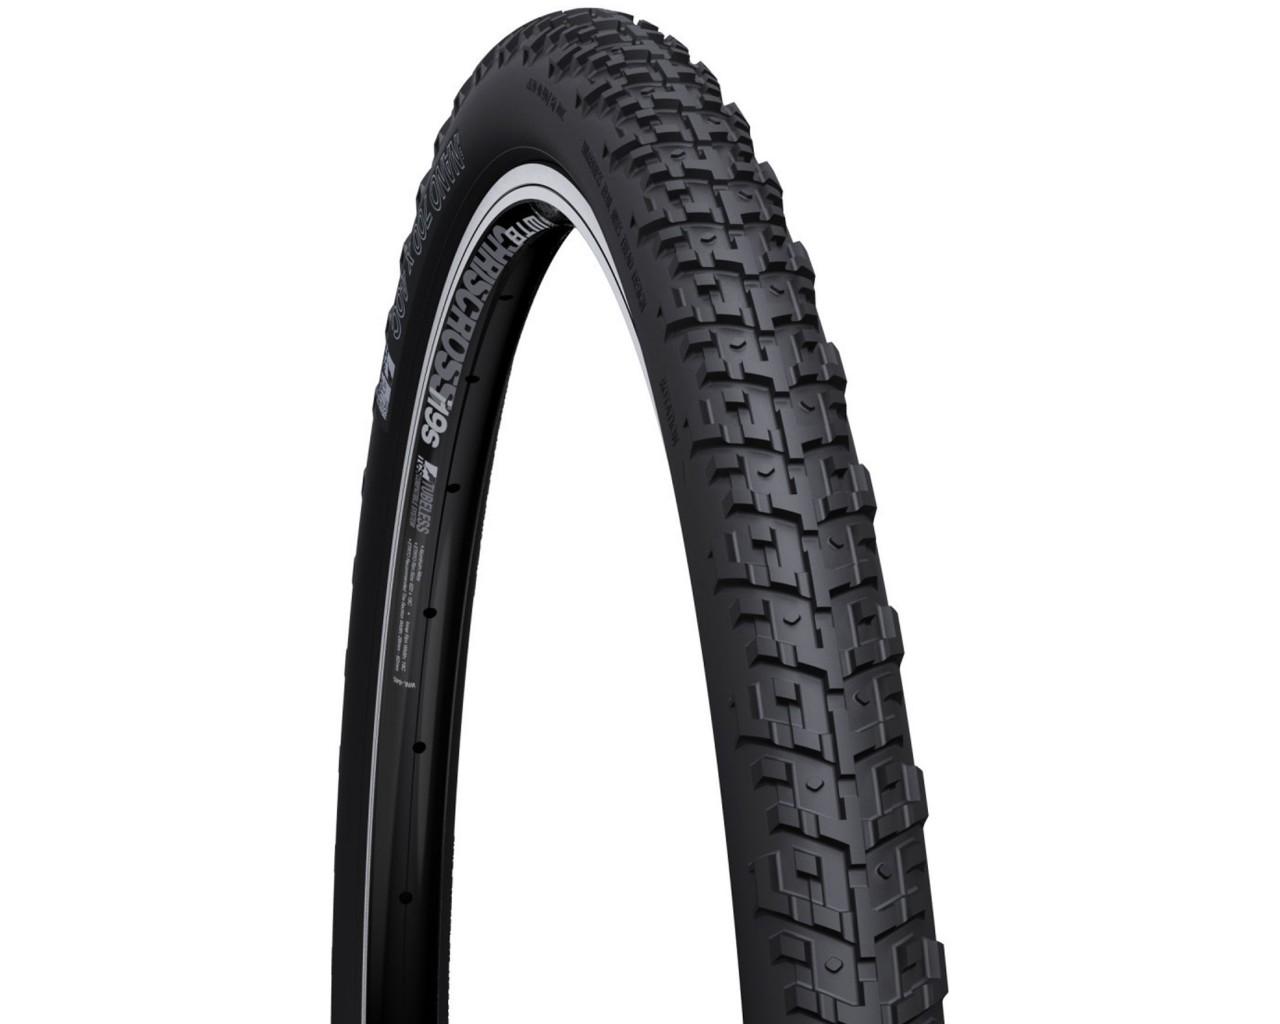 WTB Nano TCS 700c Gravel Reifen 28 Zoll 700x40c | black/Light